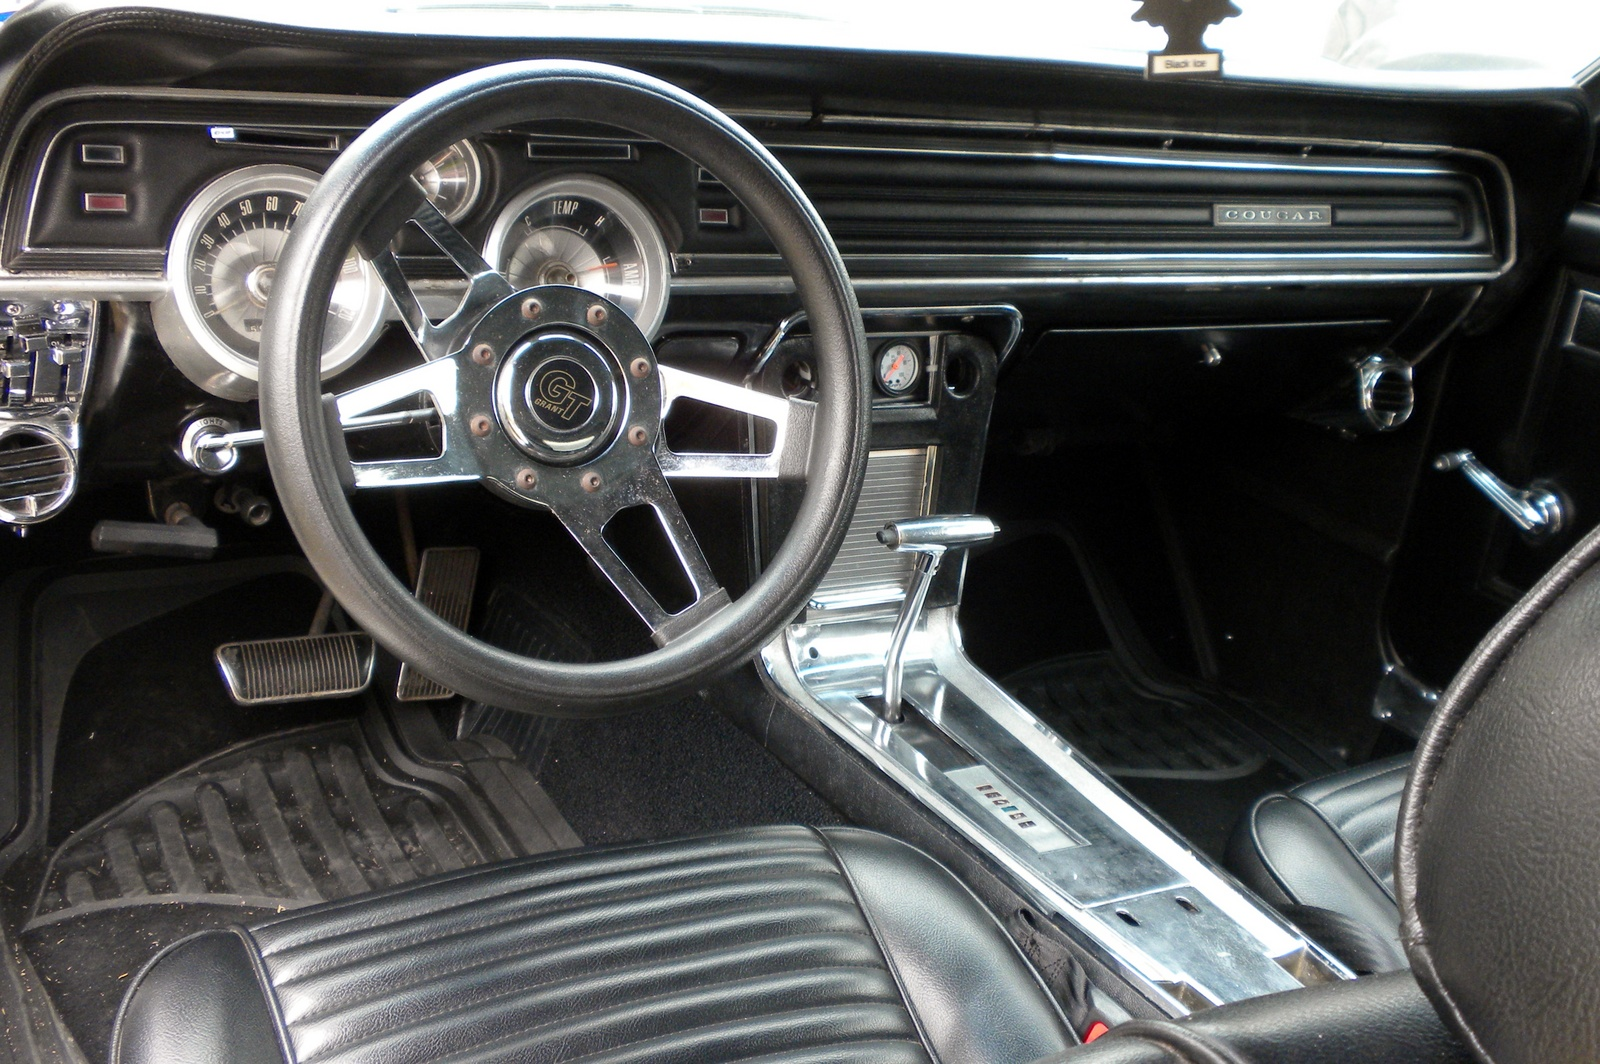 Mercury Cougar Pic on 1967 Mercury Montego